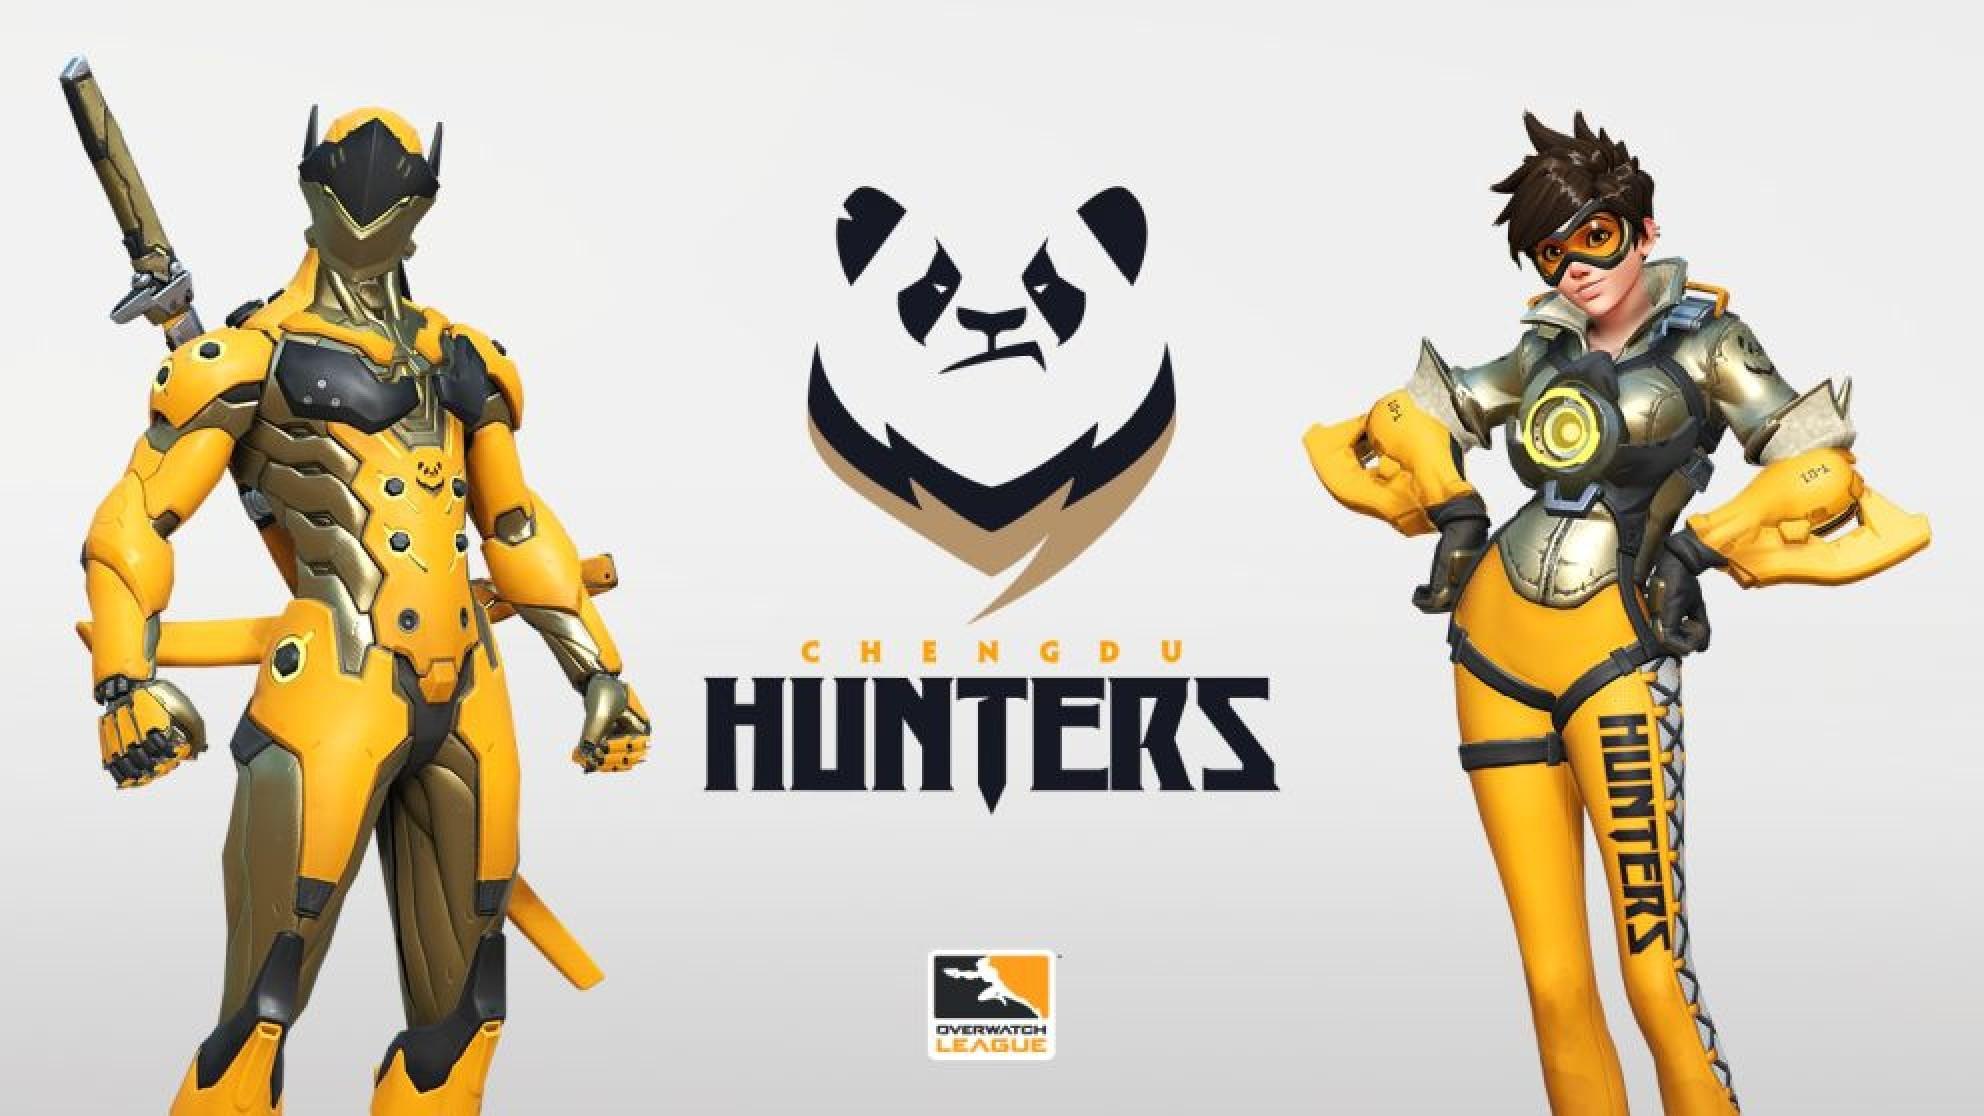 Chengdu Hunters  - Chinese OWL Expansion Team Revealed